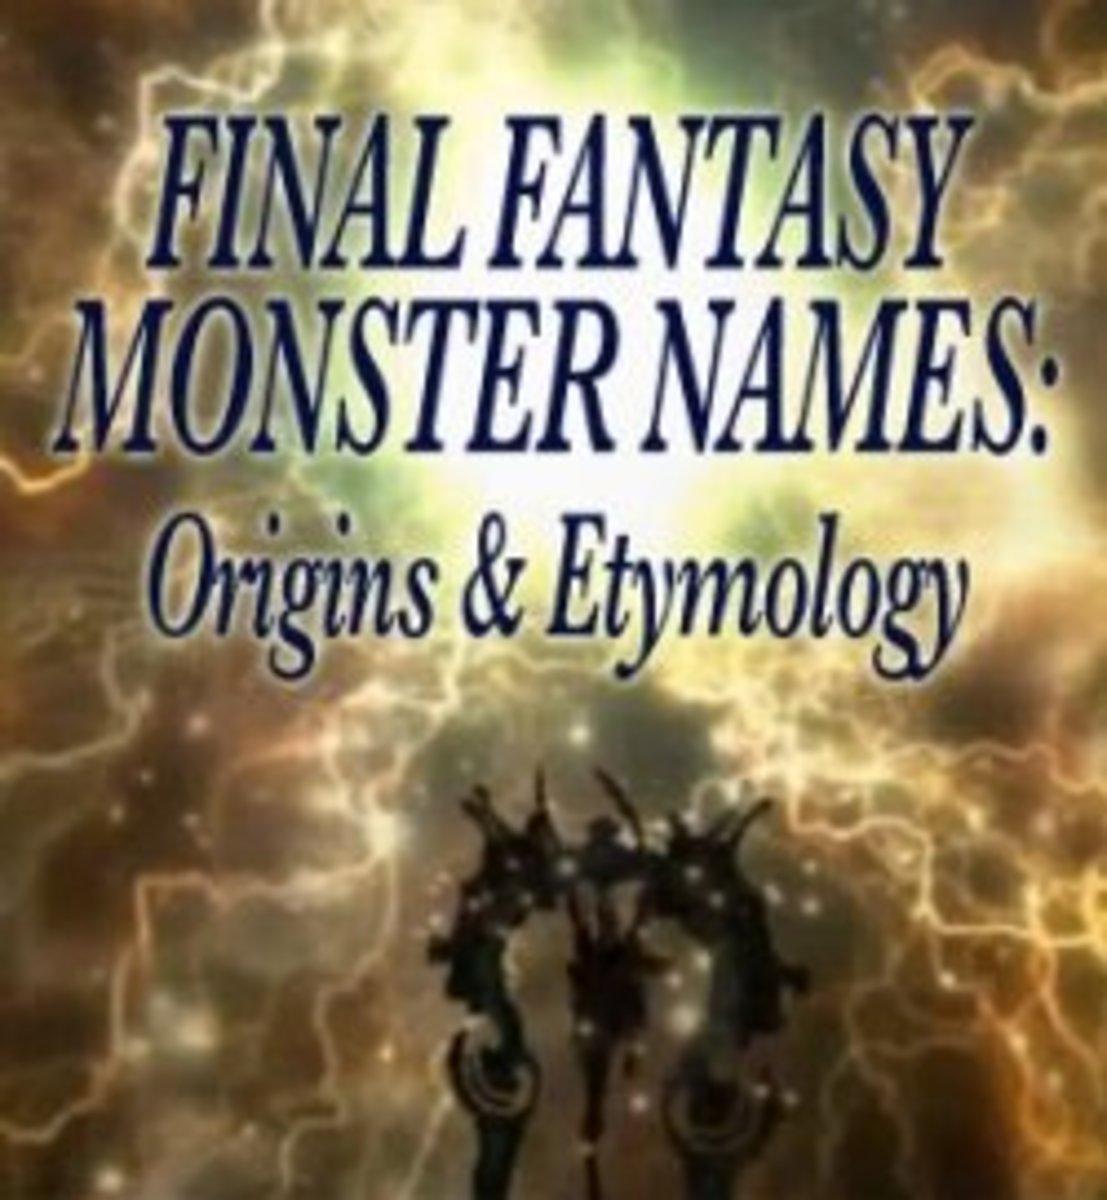 final-fantasy-monster-names